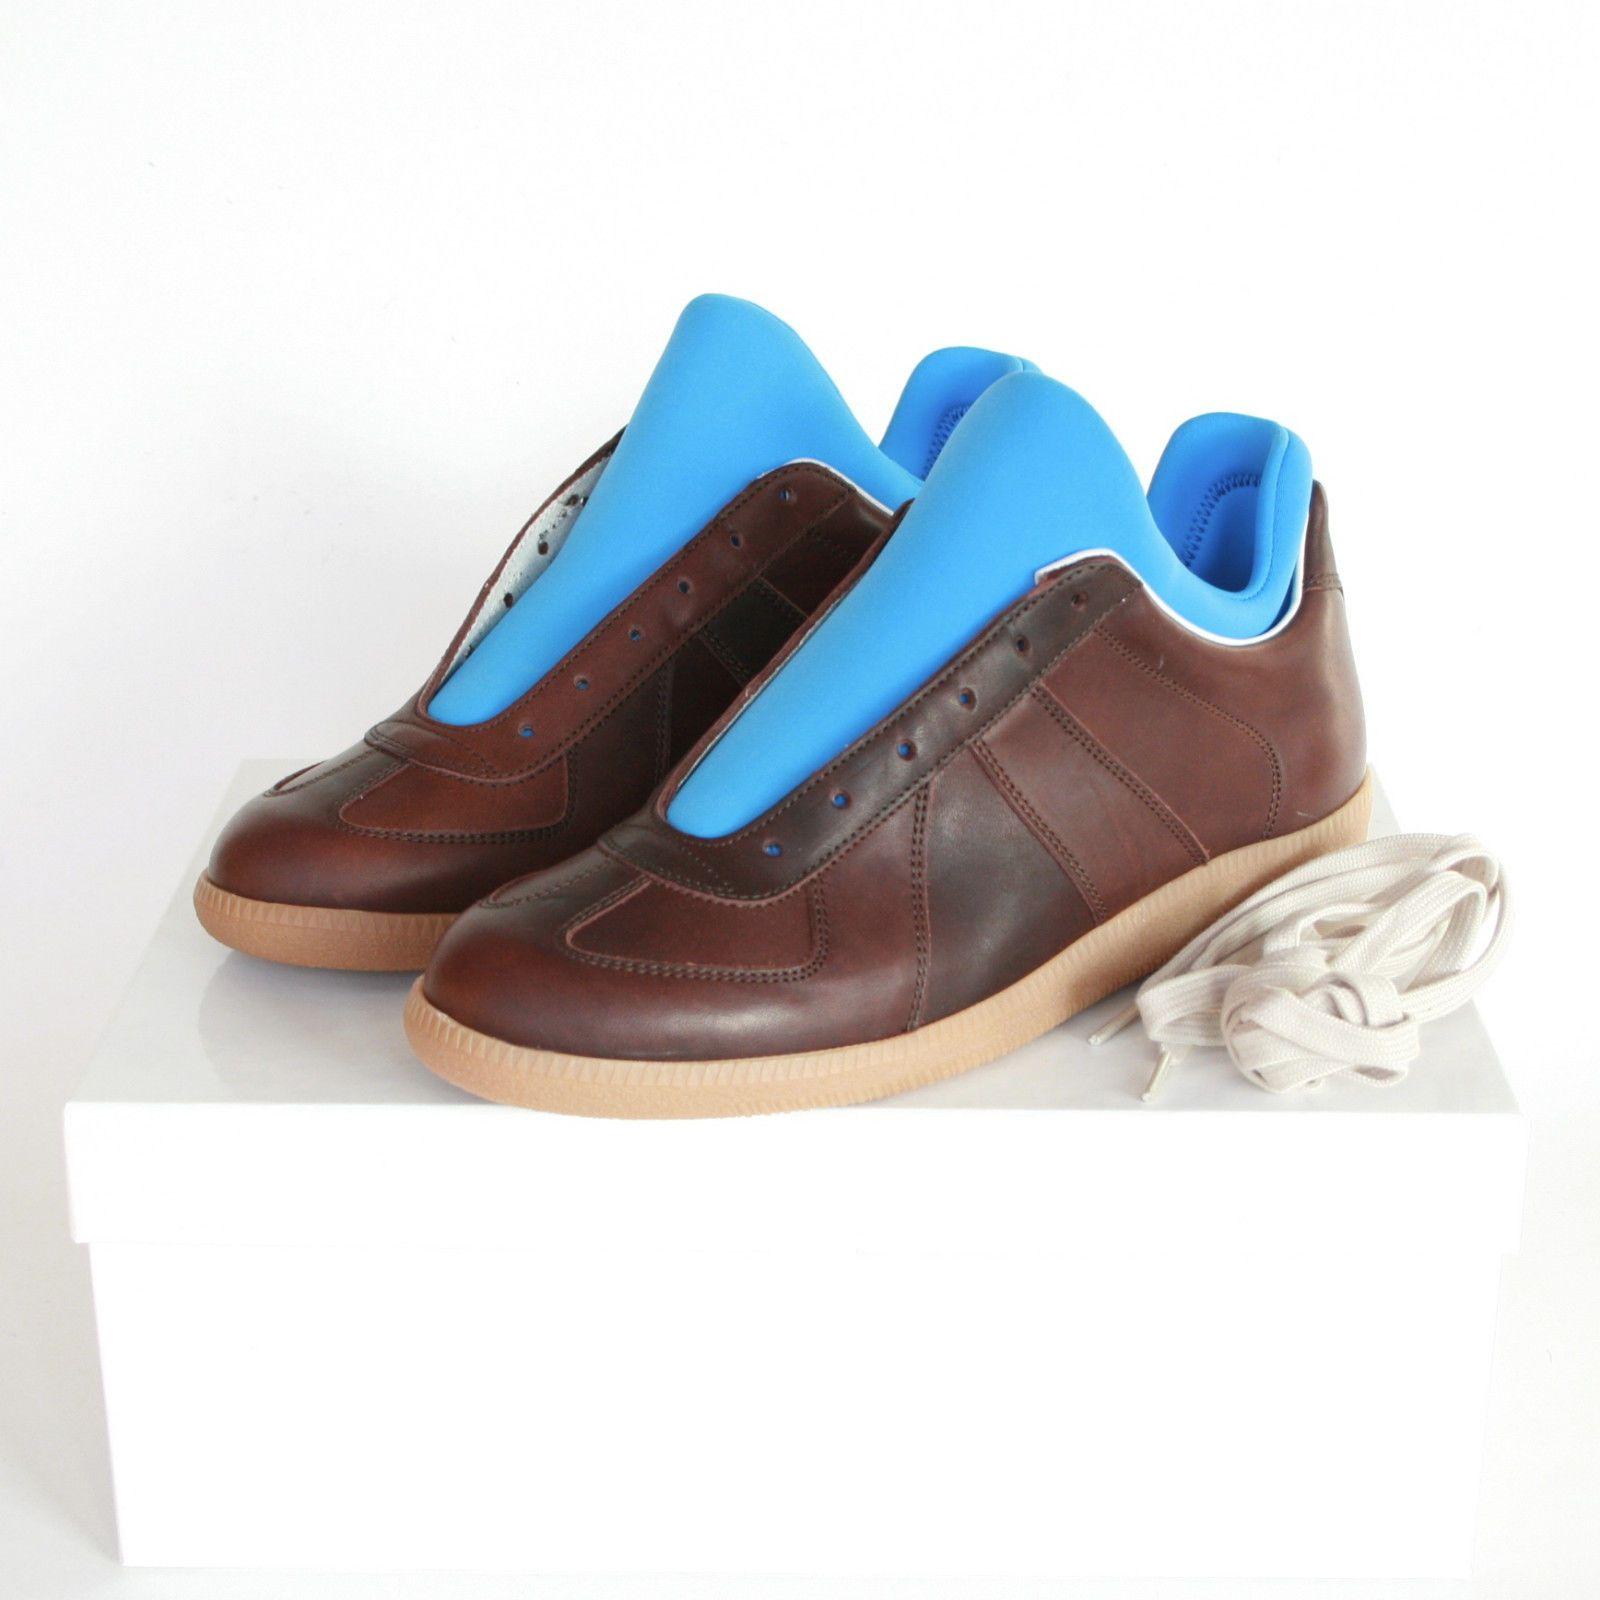 MAISON MARGIELA MARTIN MARGIELA MAISON Hombre Zapatos Talla 42IT f8d437